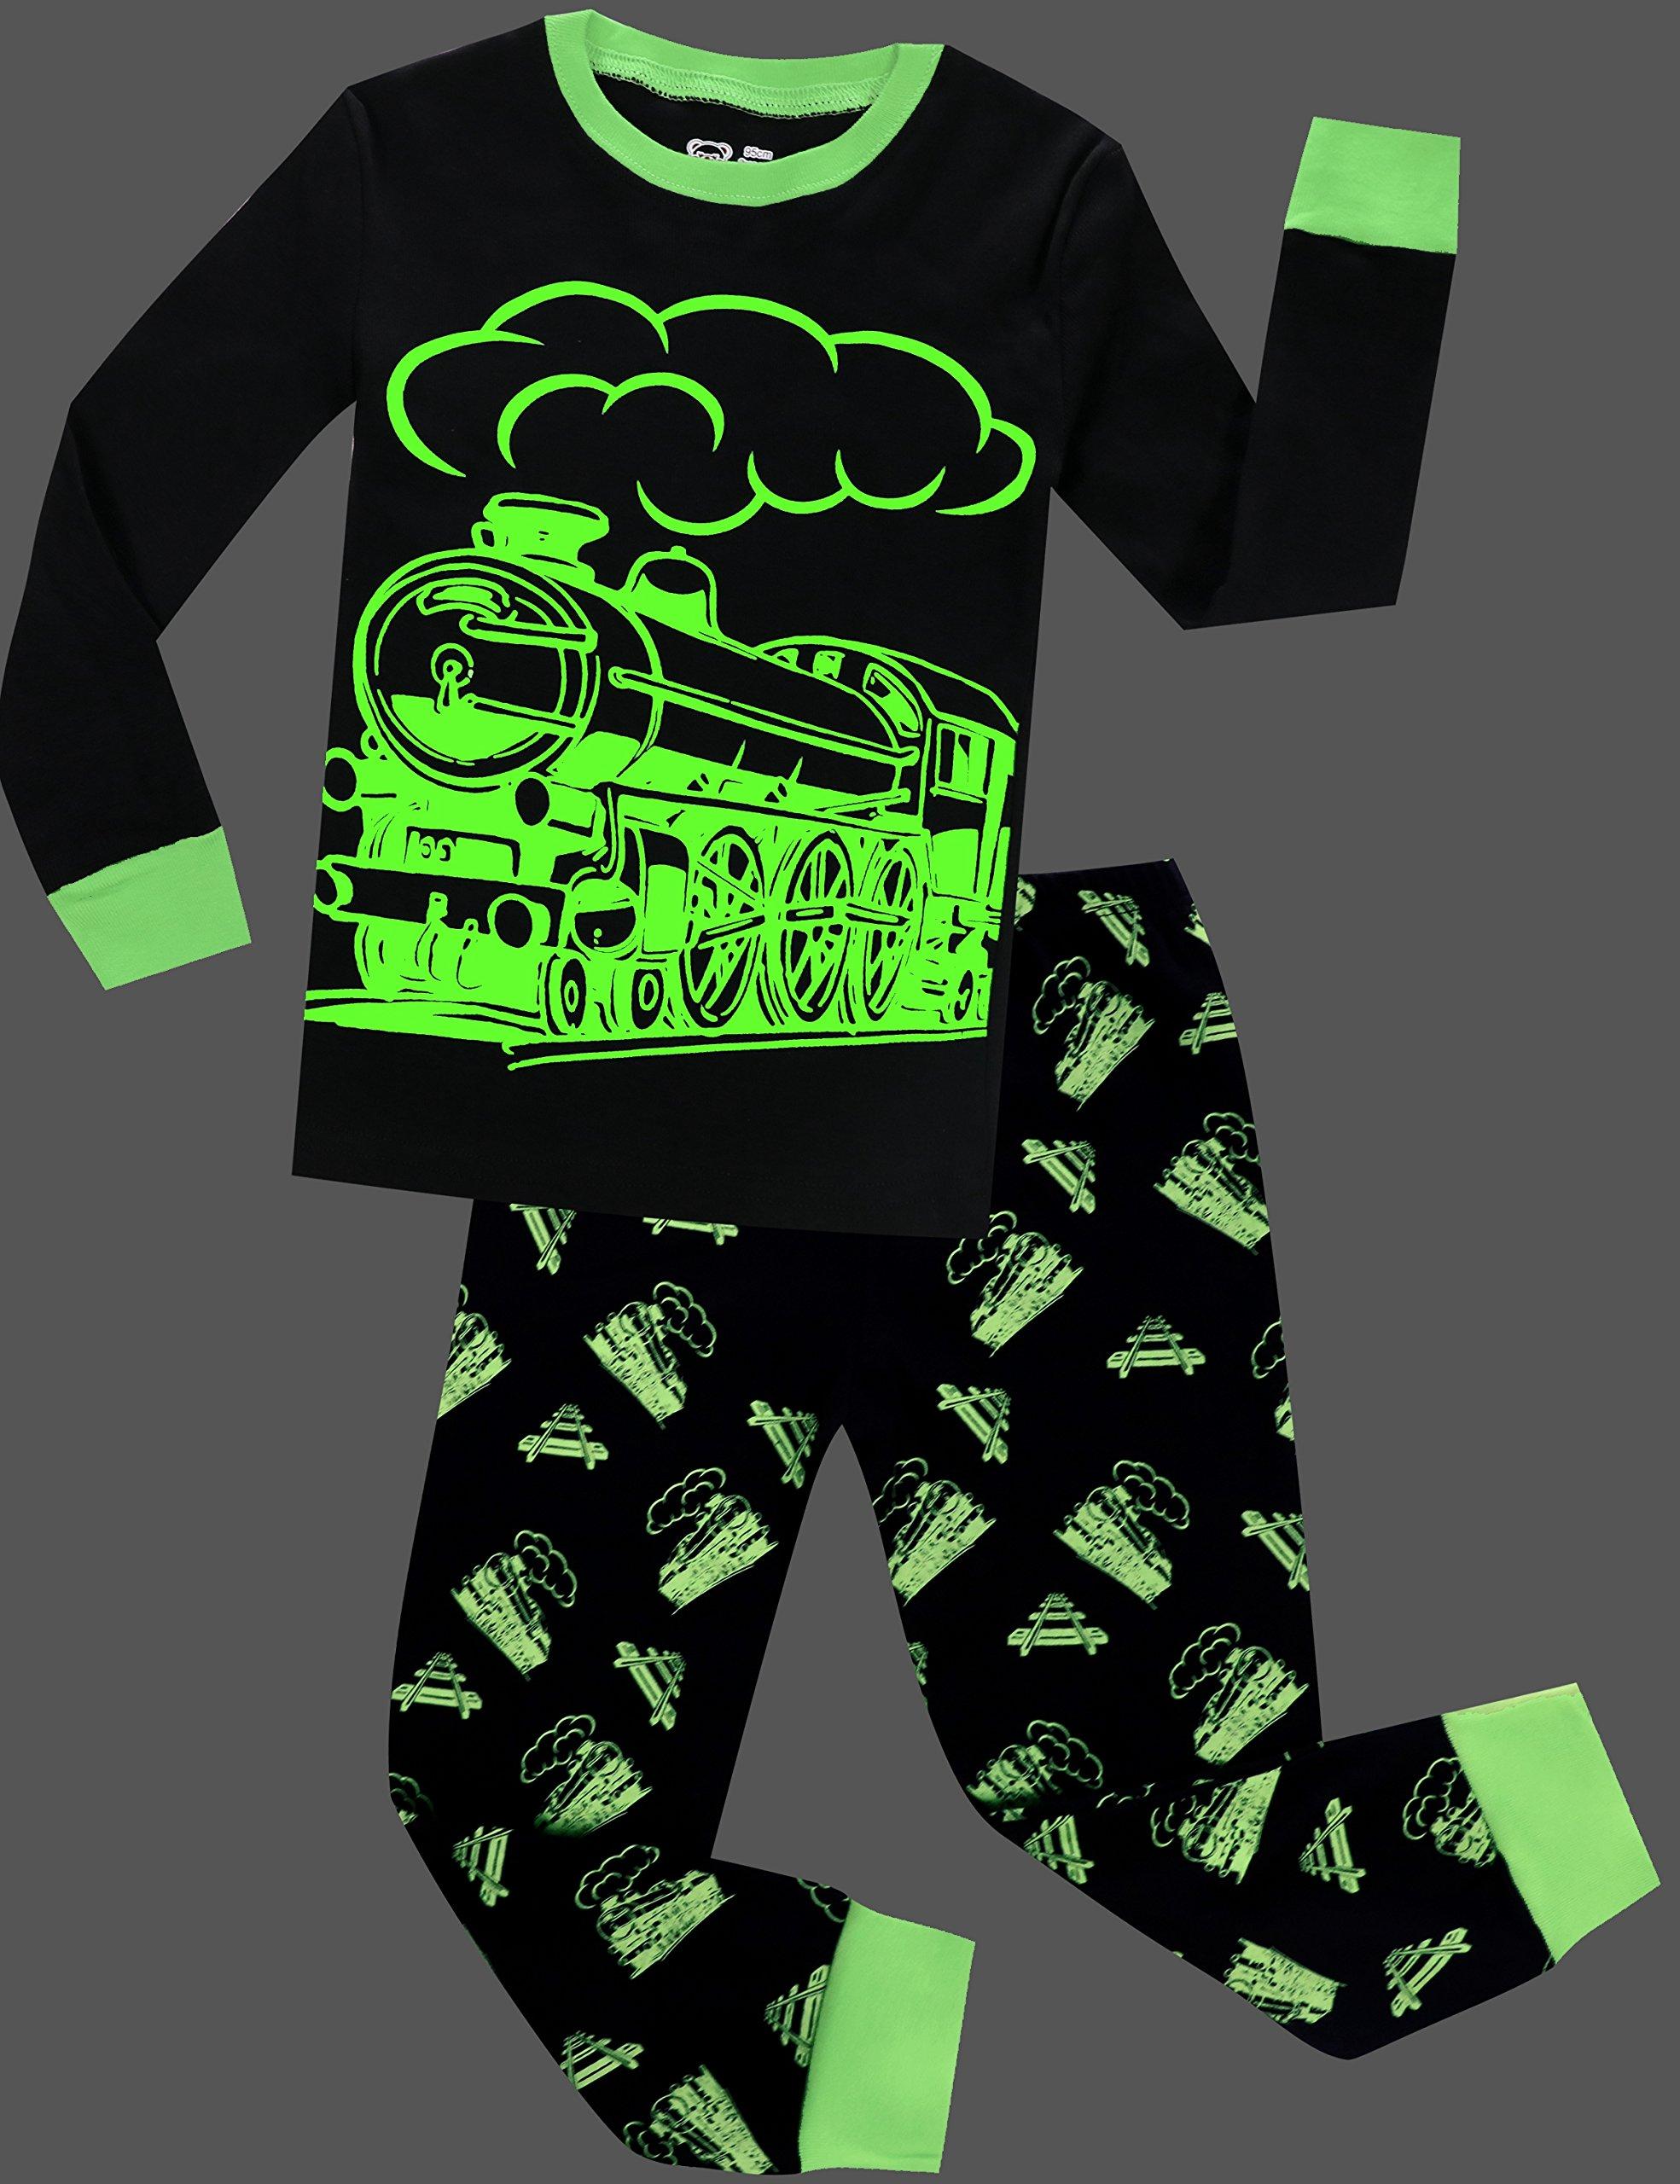 Boys Christmas Pajamas Pjs for Girls Sleepwear Children Clothes Stripe Pants Set Size 8 by BebeBear (Image #2)